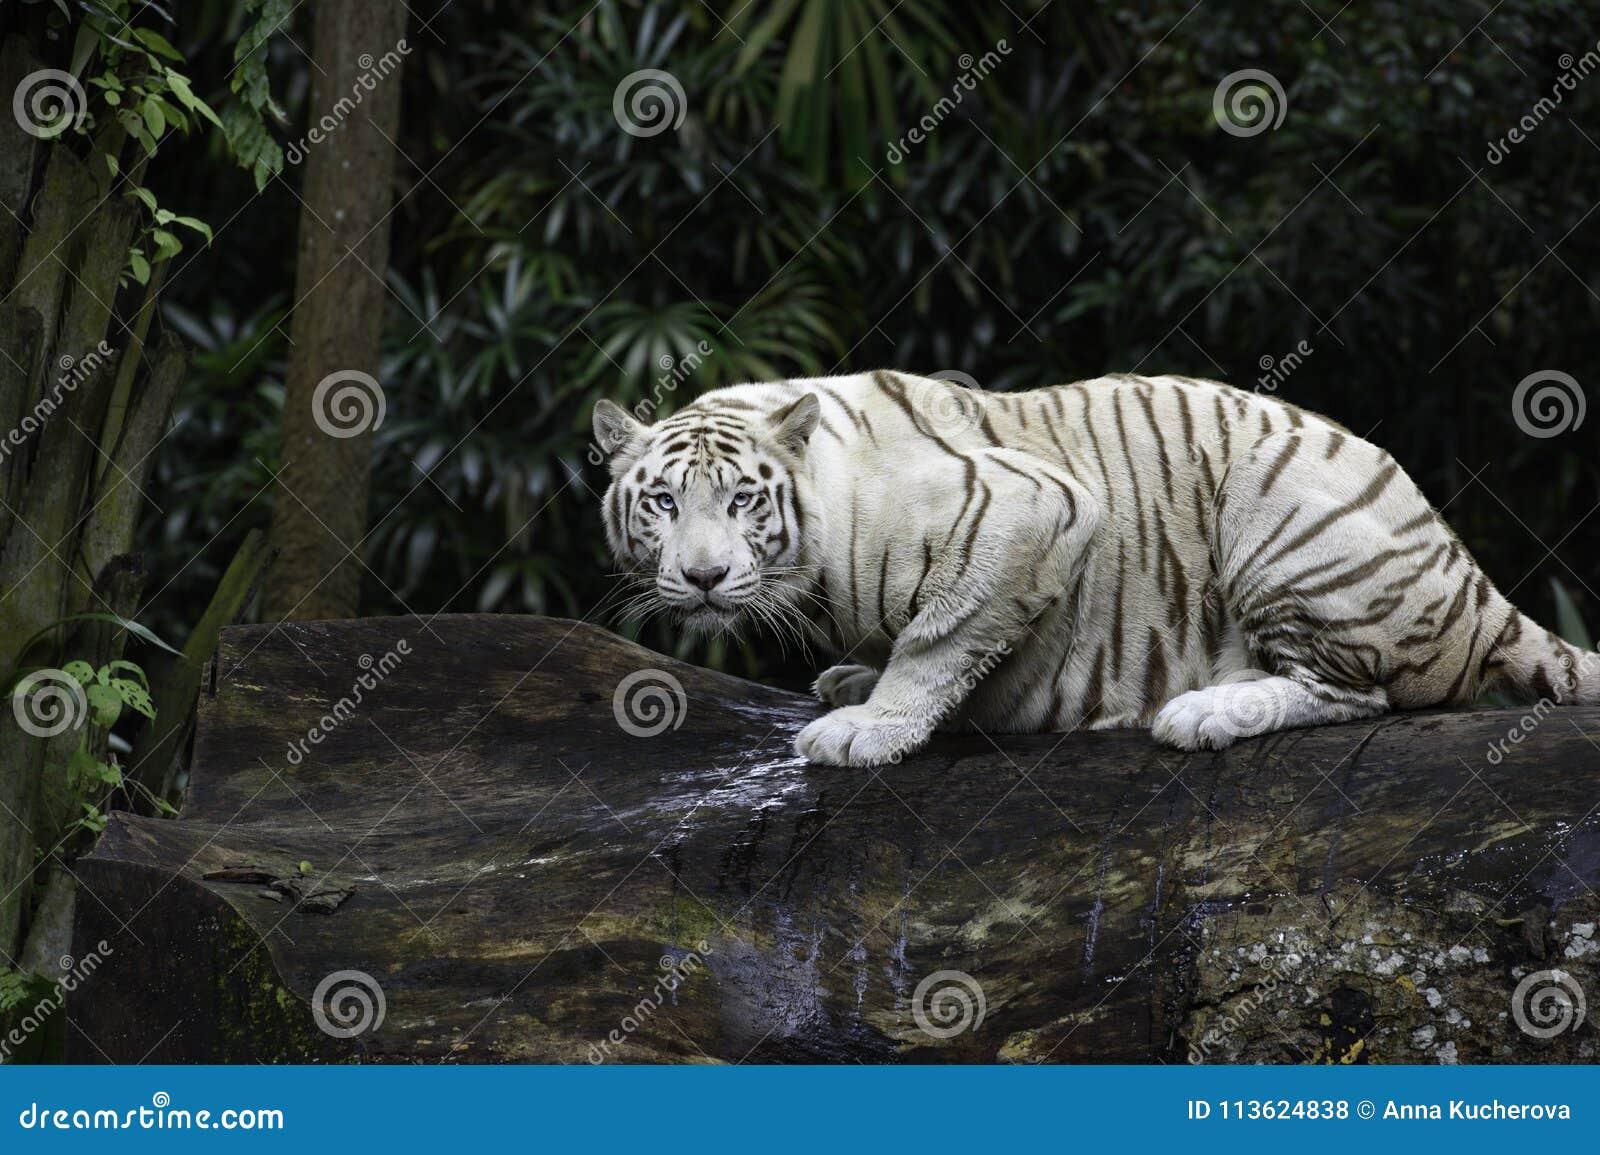 tiger jungle stock photos - download 10,534 images